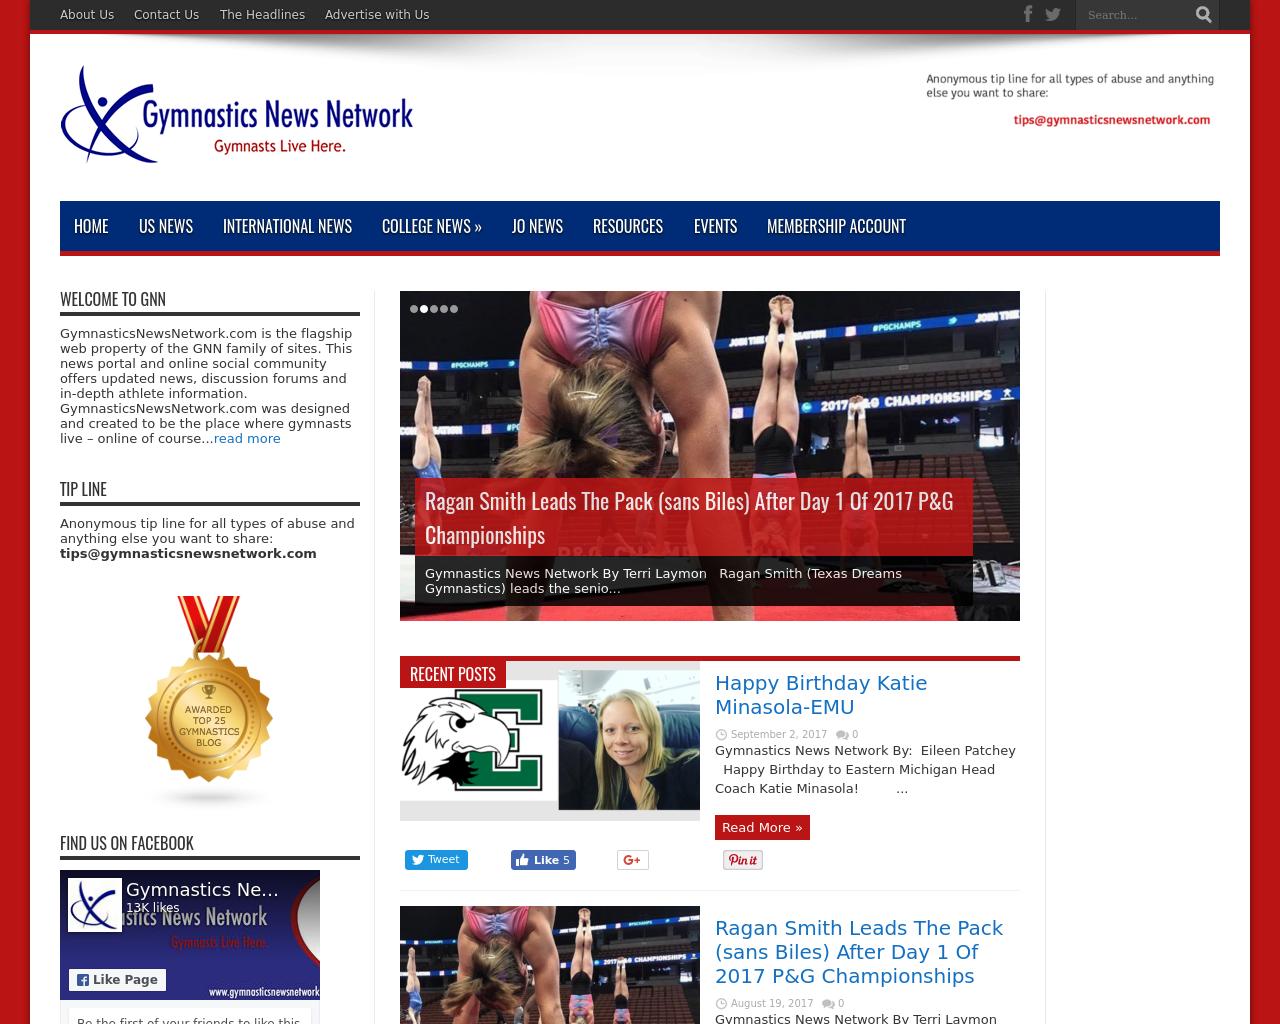 Gymnastics-News-Network-Advertising-Reviews-Pricing